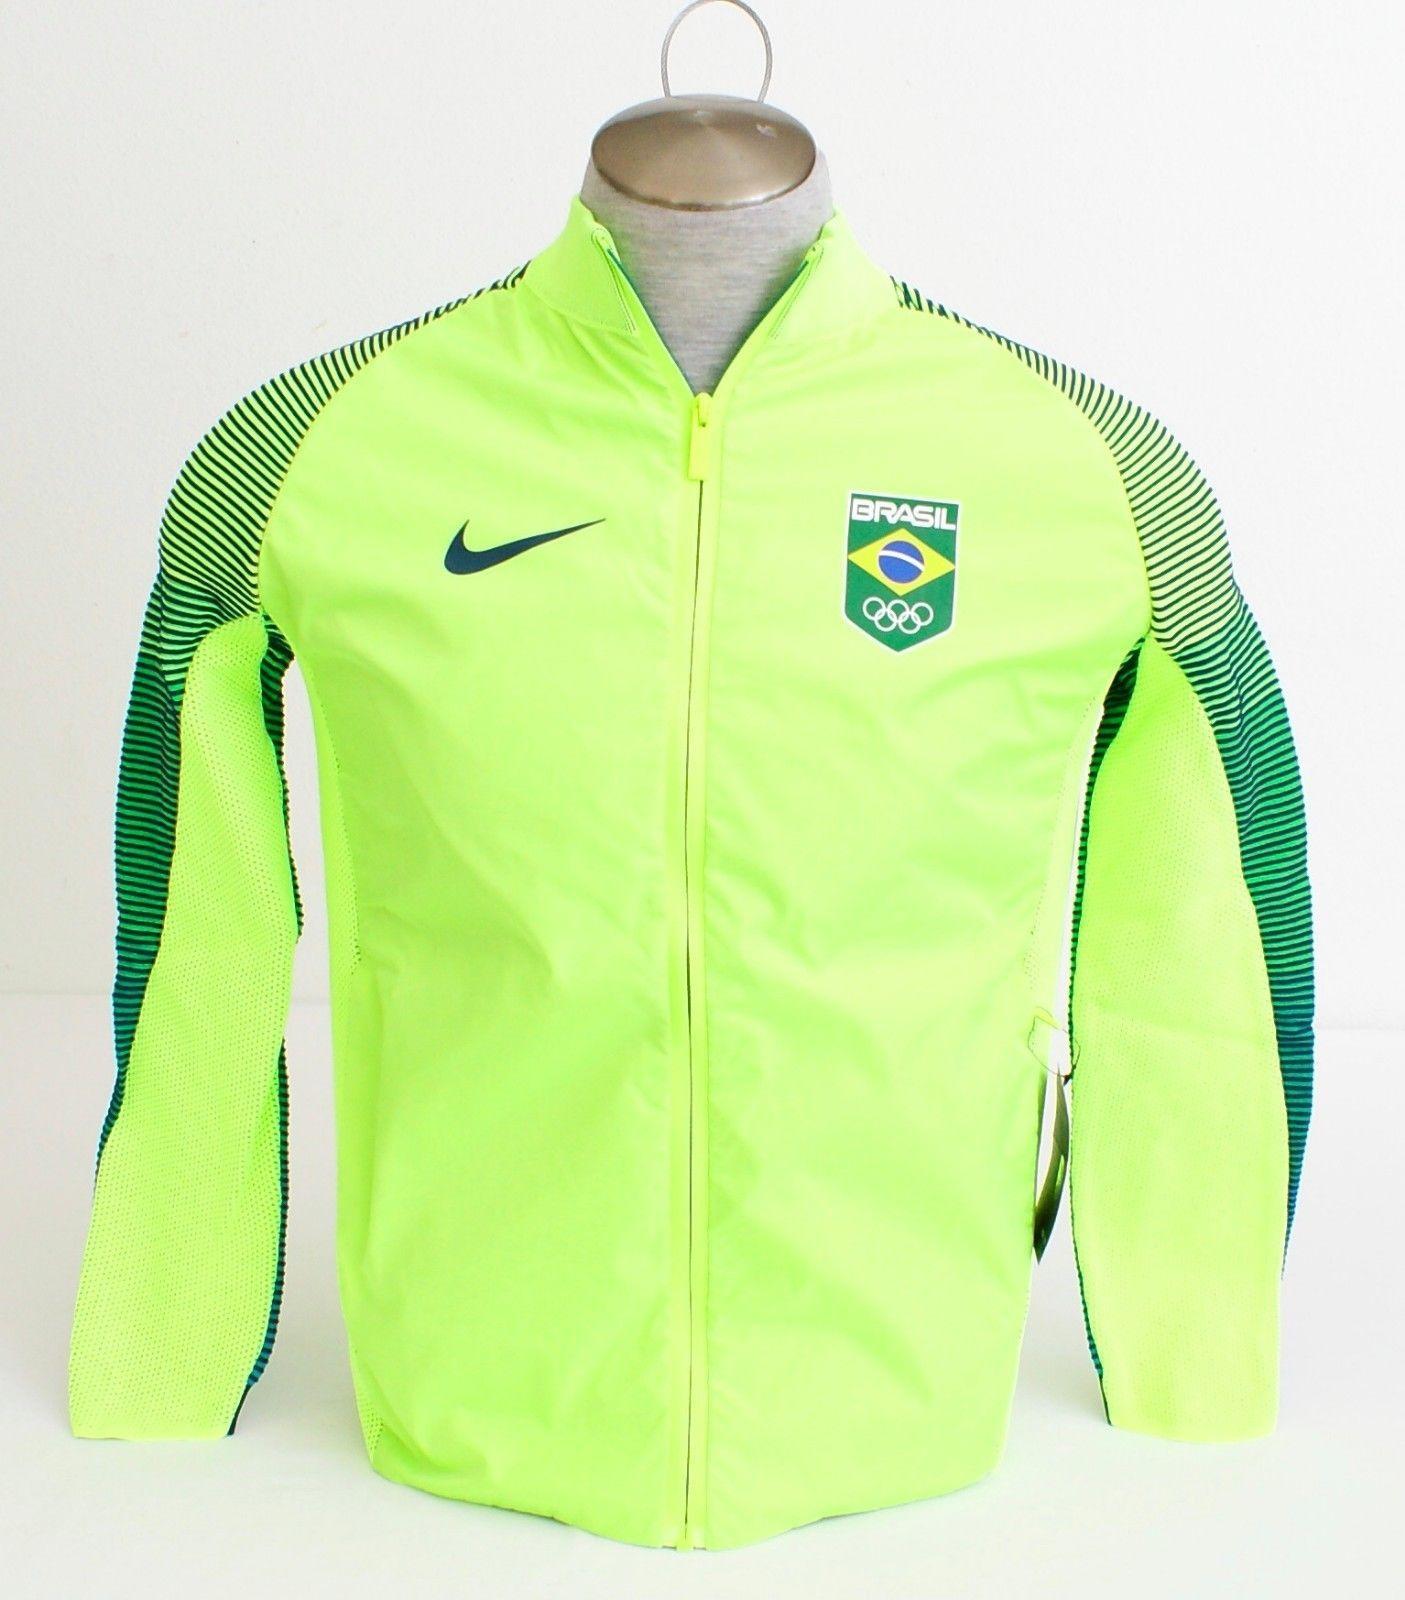 4f611f43f8 57. 57. Previous. Nike NikeLab Volt Dynamic Reveal Team Brazil Rio Olympics 2016  Jacket Men s NWT